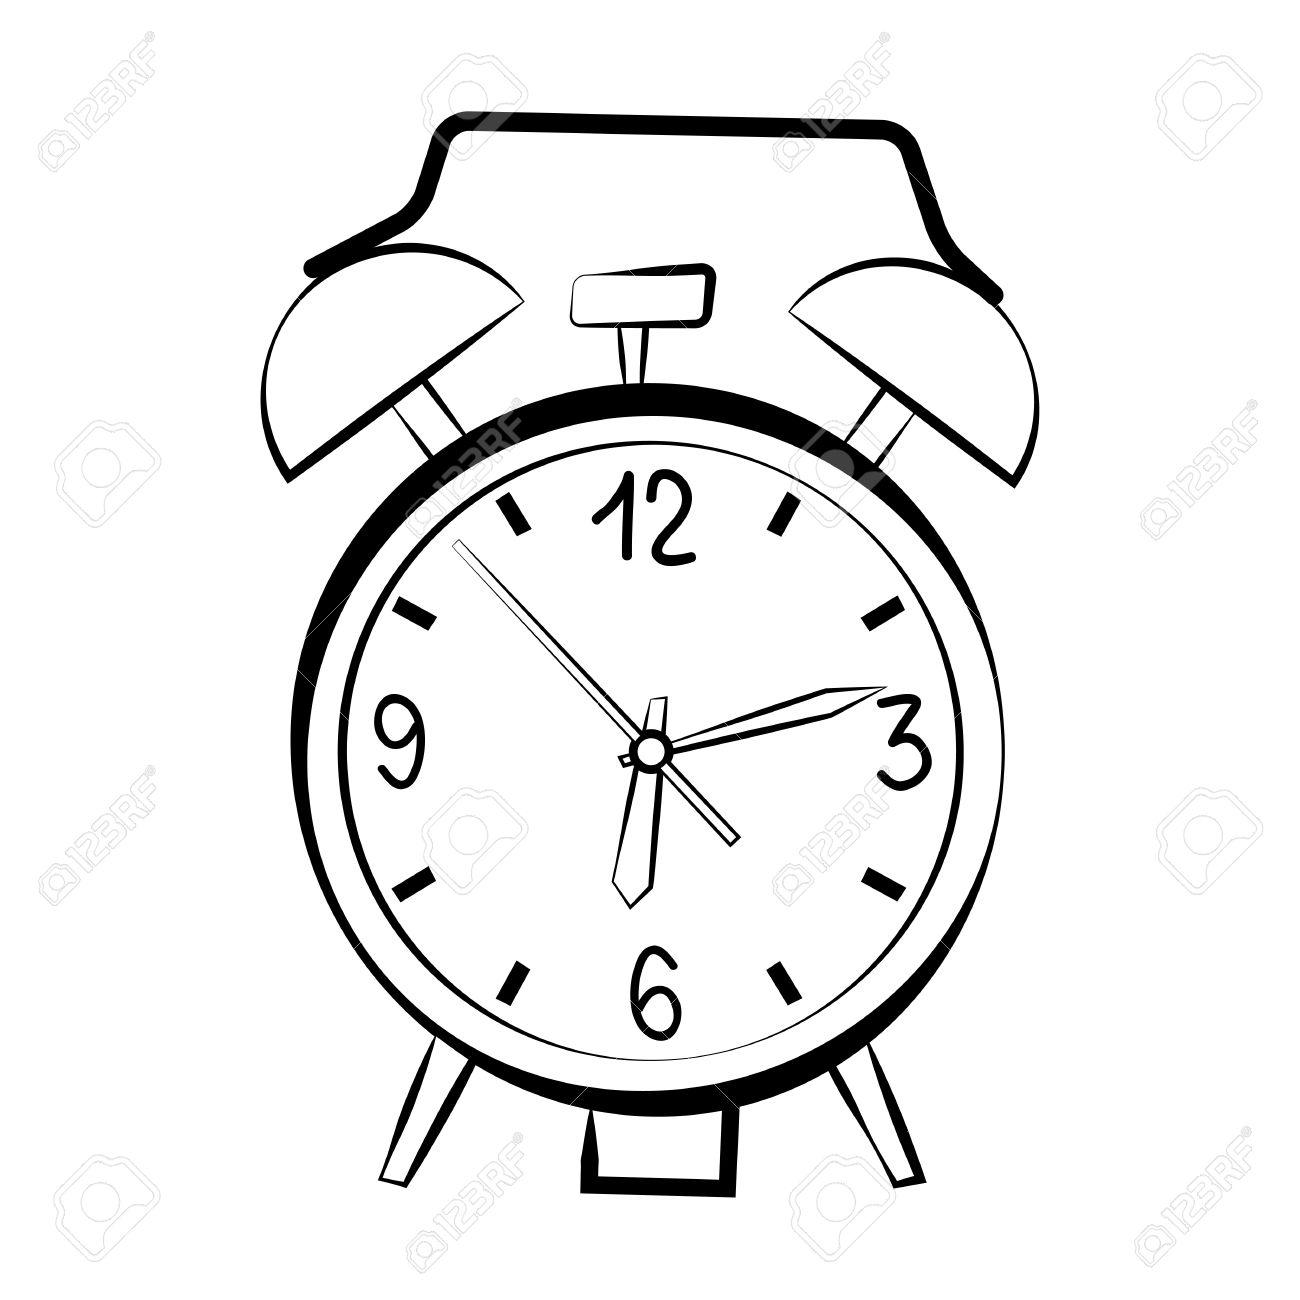 1300x1300 Alarm Clock Sketch Royalty Free Cliparts, Vectors, And Stock